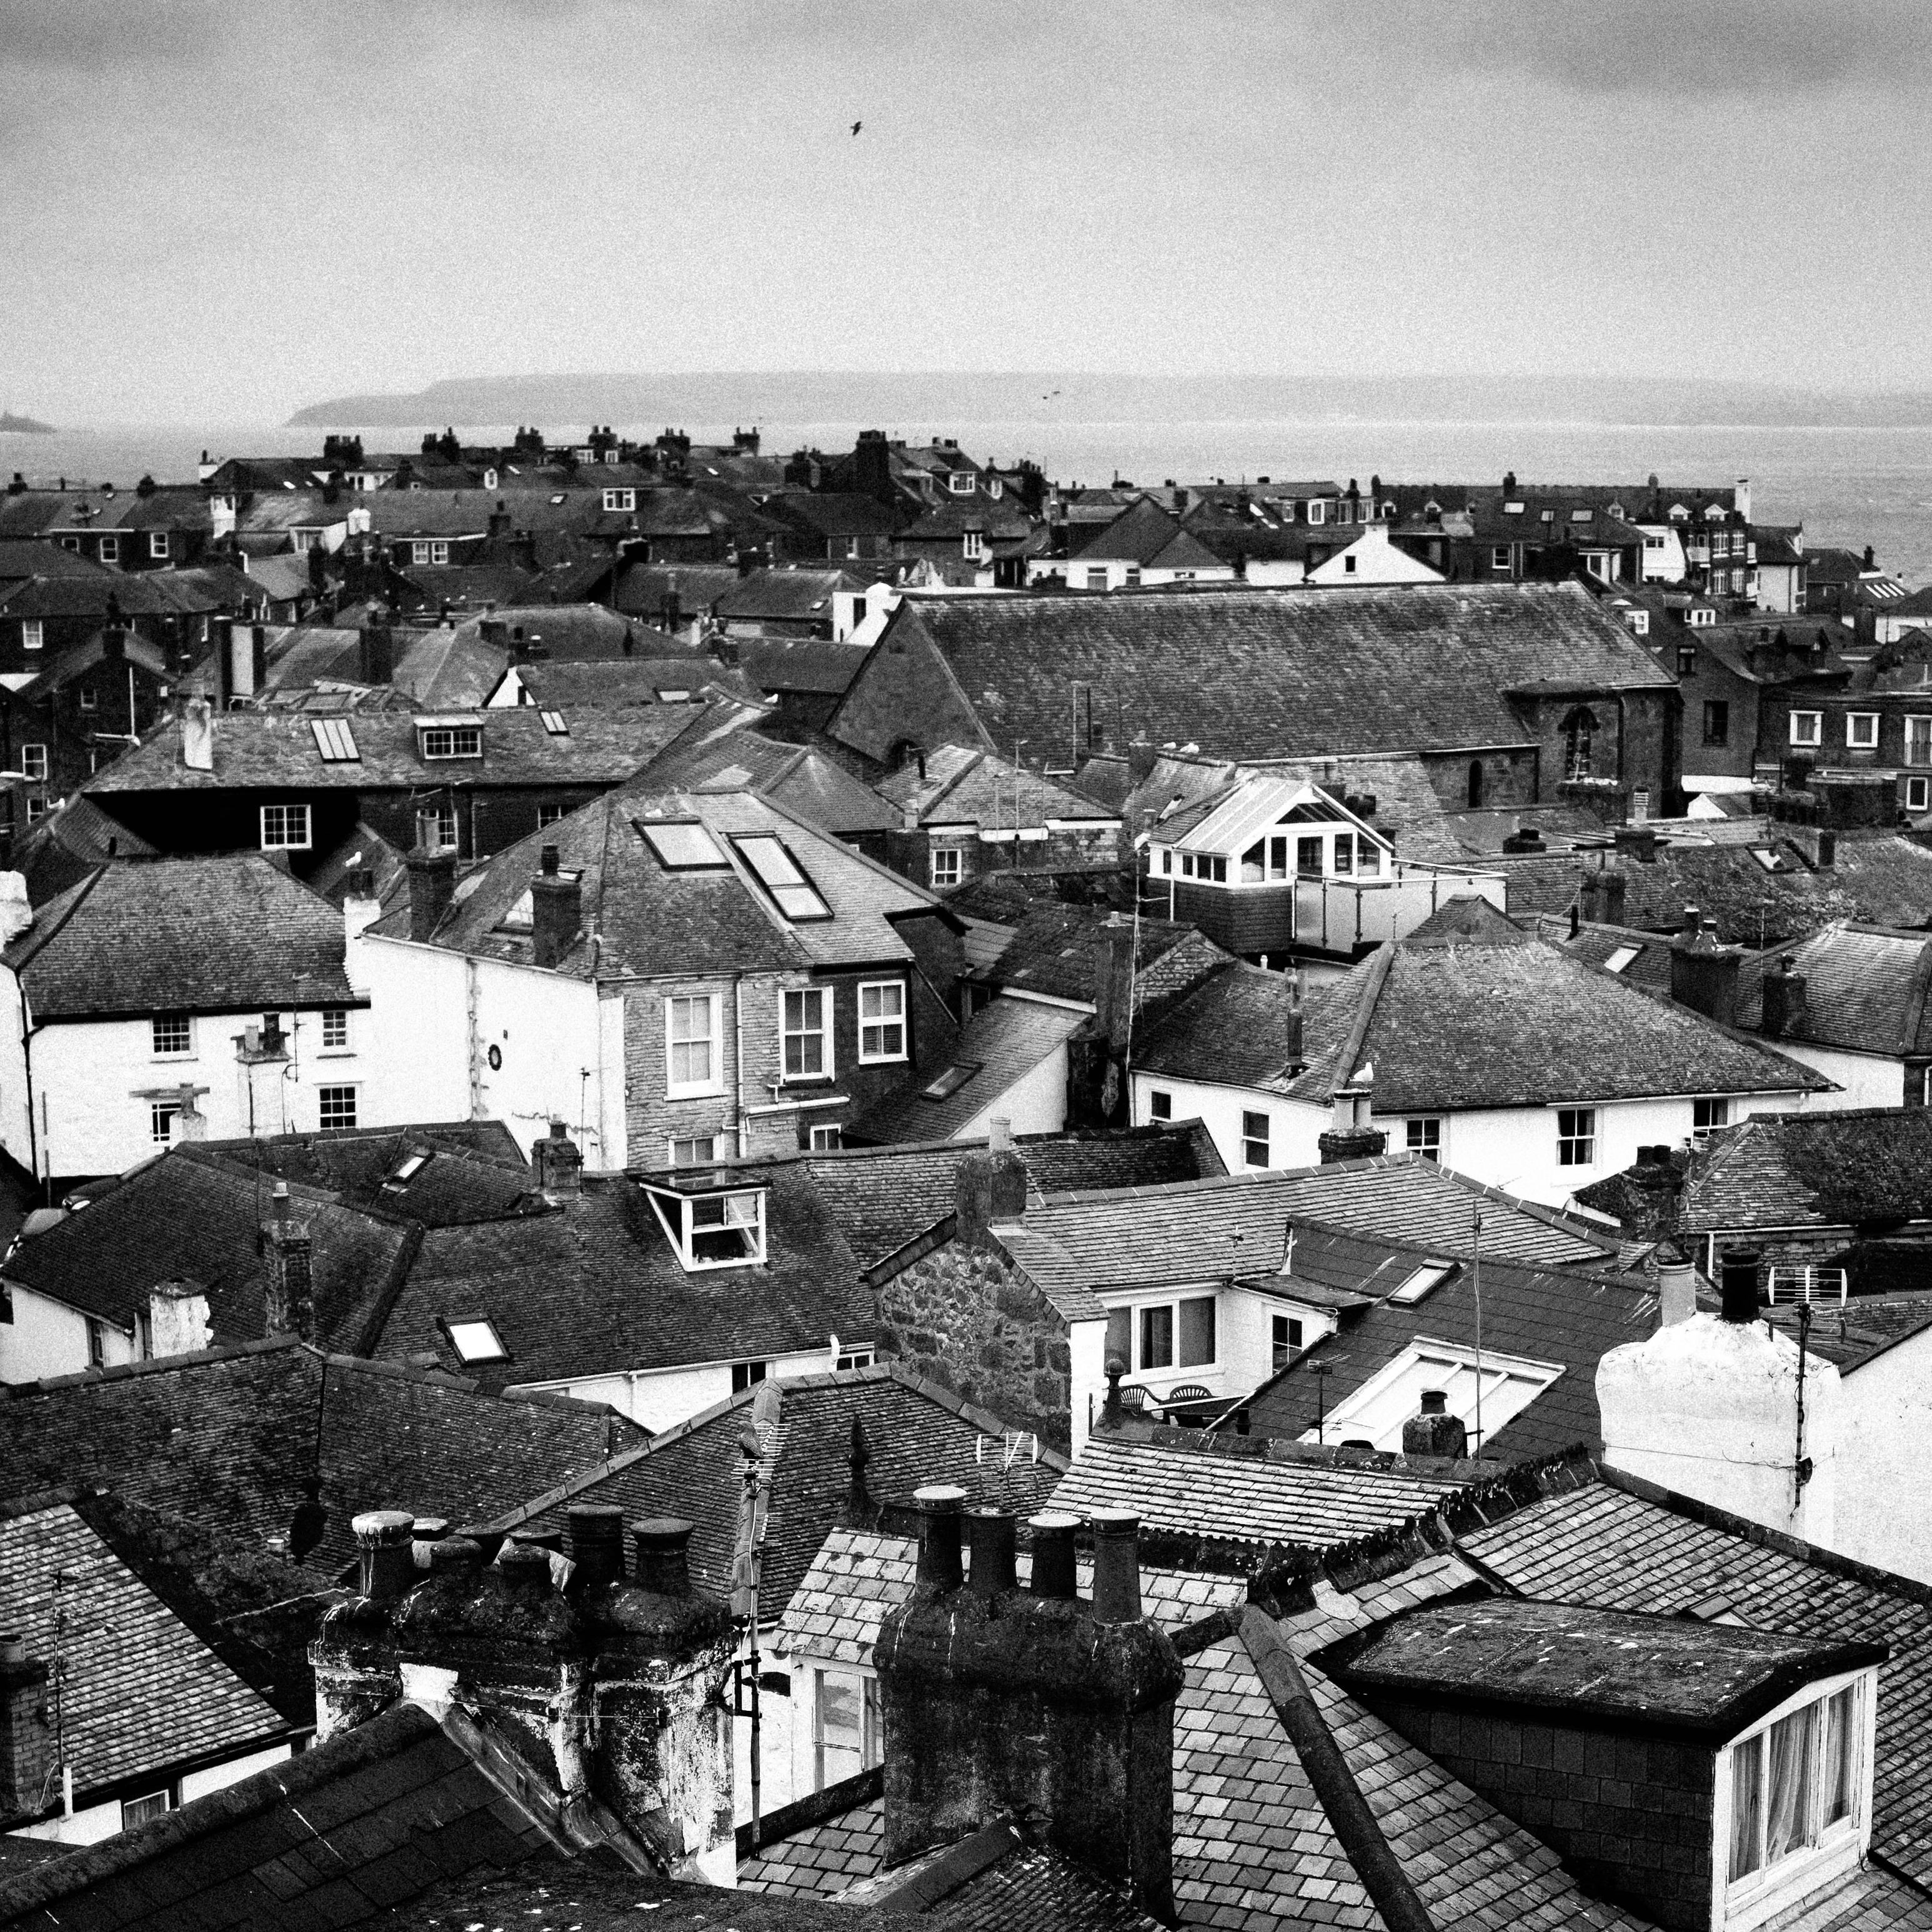 View of Charlestown, Cornwall - 08/14